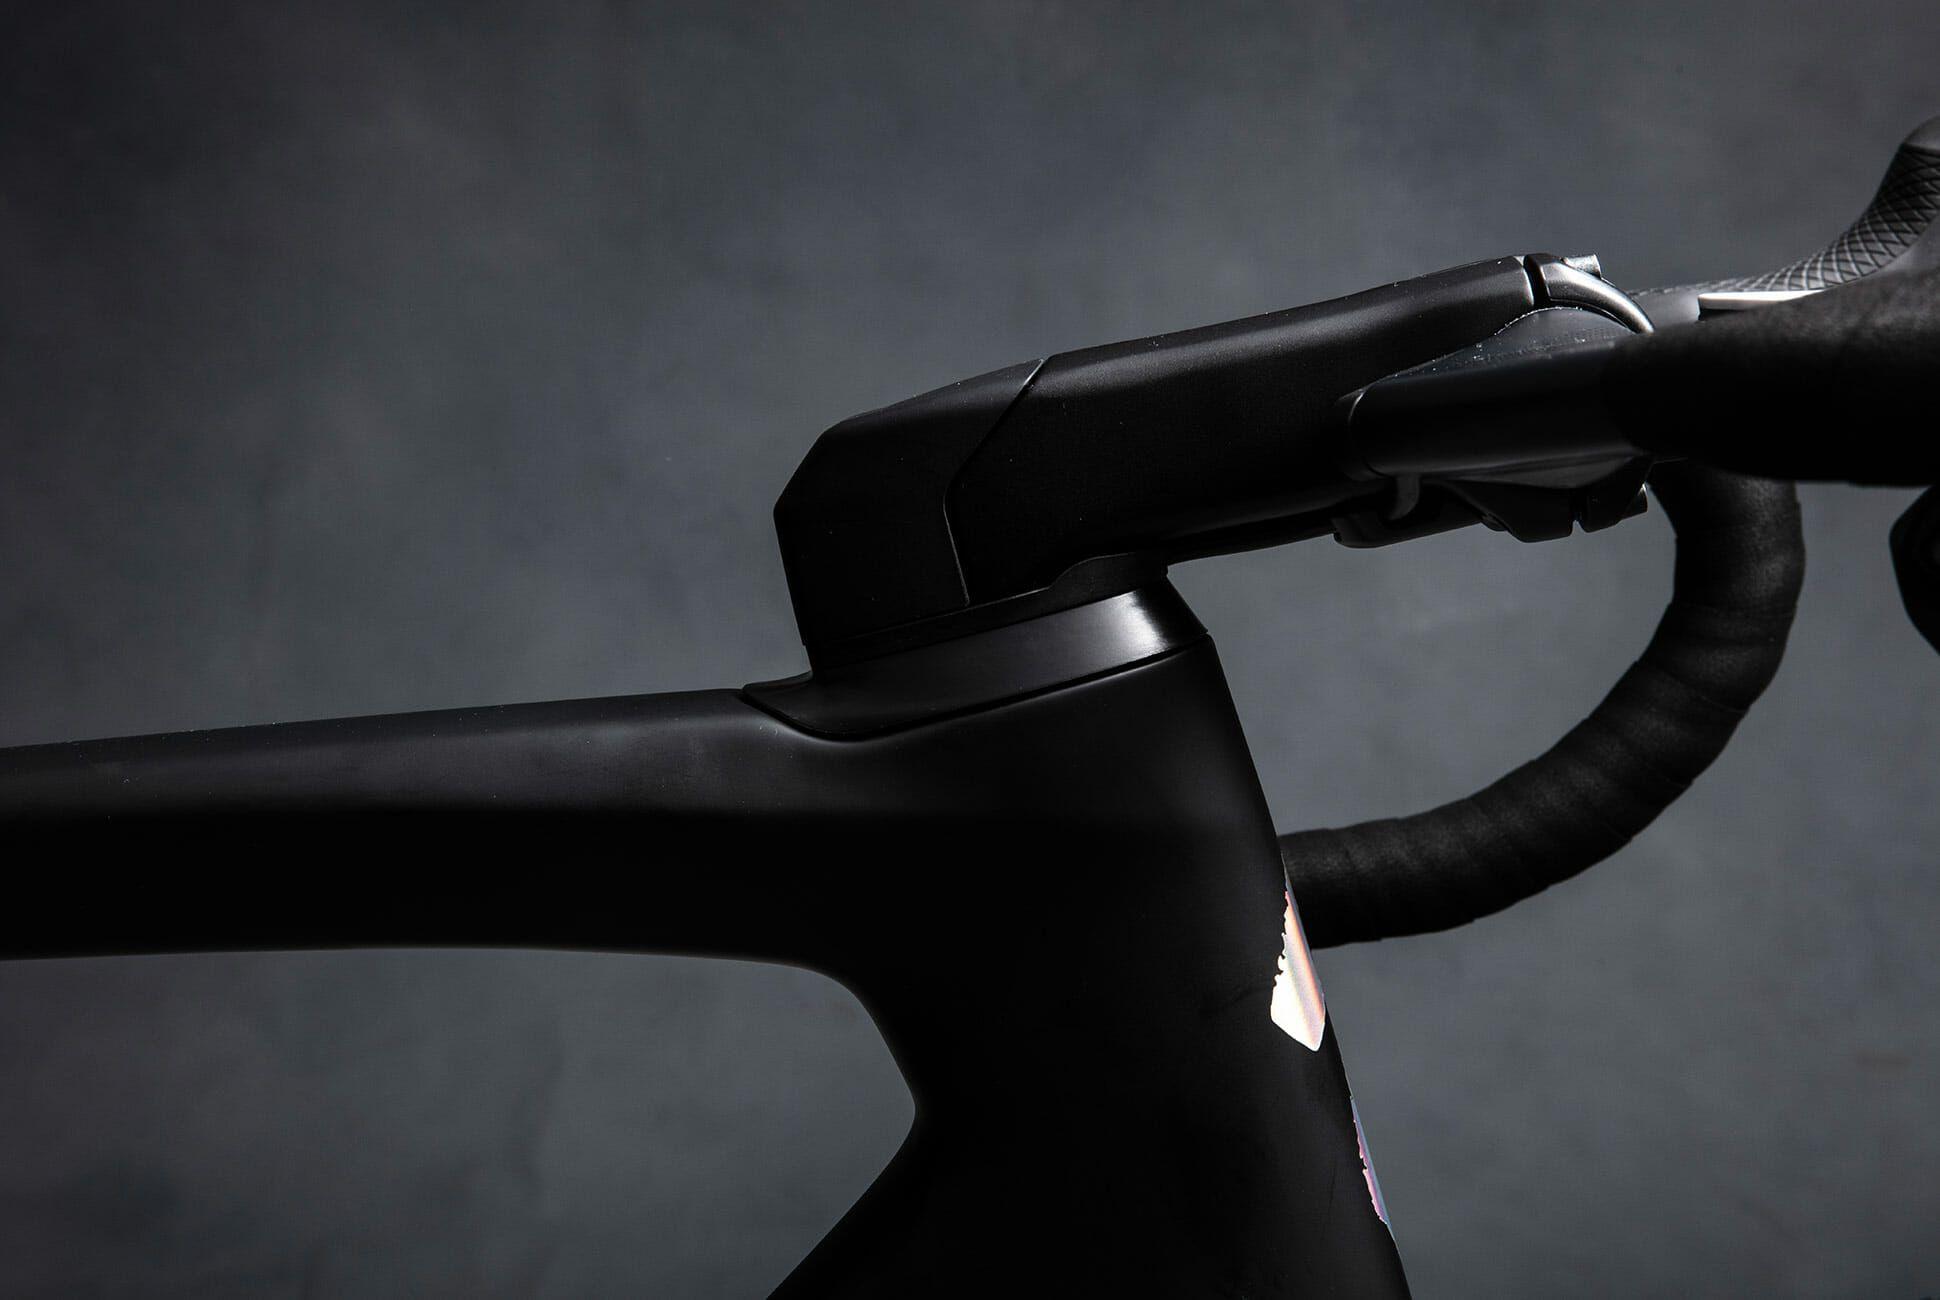 Specialized-S-Works-Venge-Road-Bike-gear-patrol-slide-5